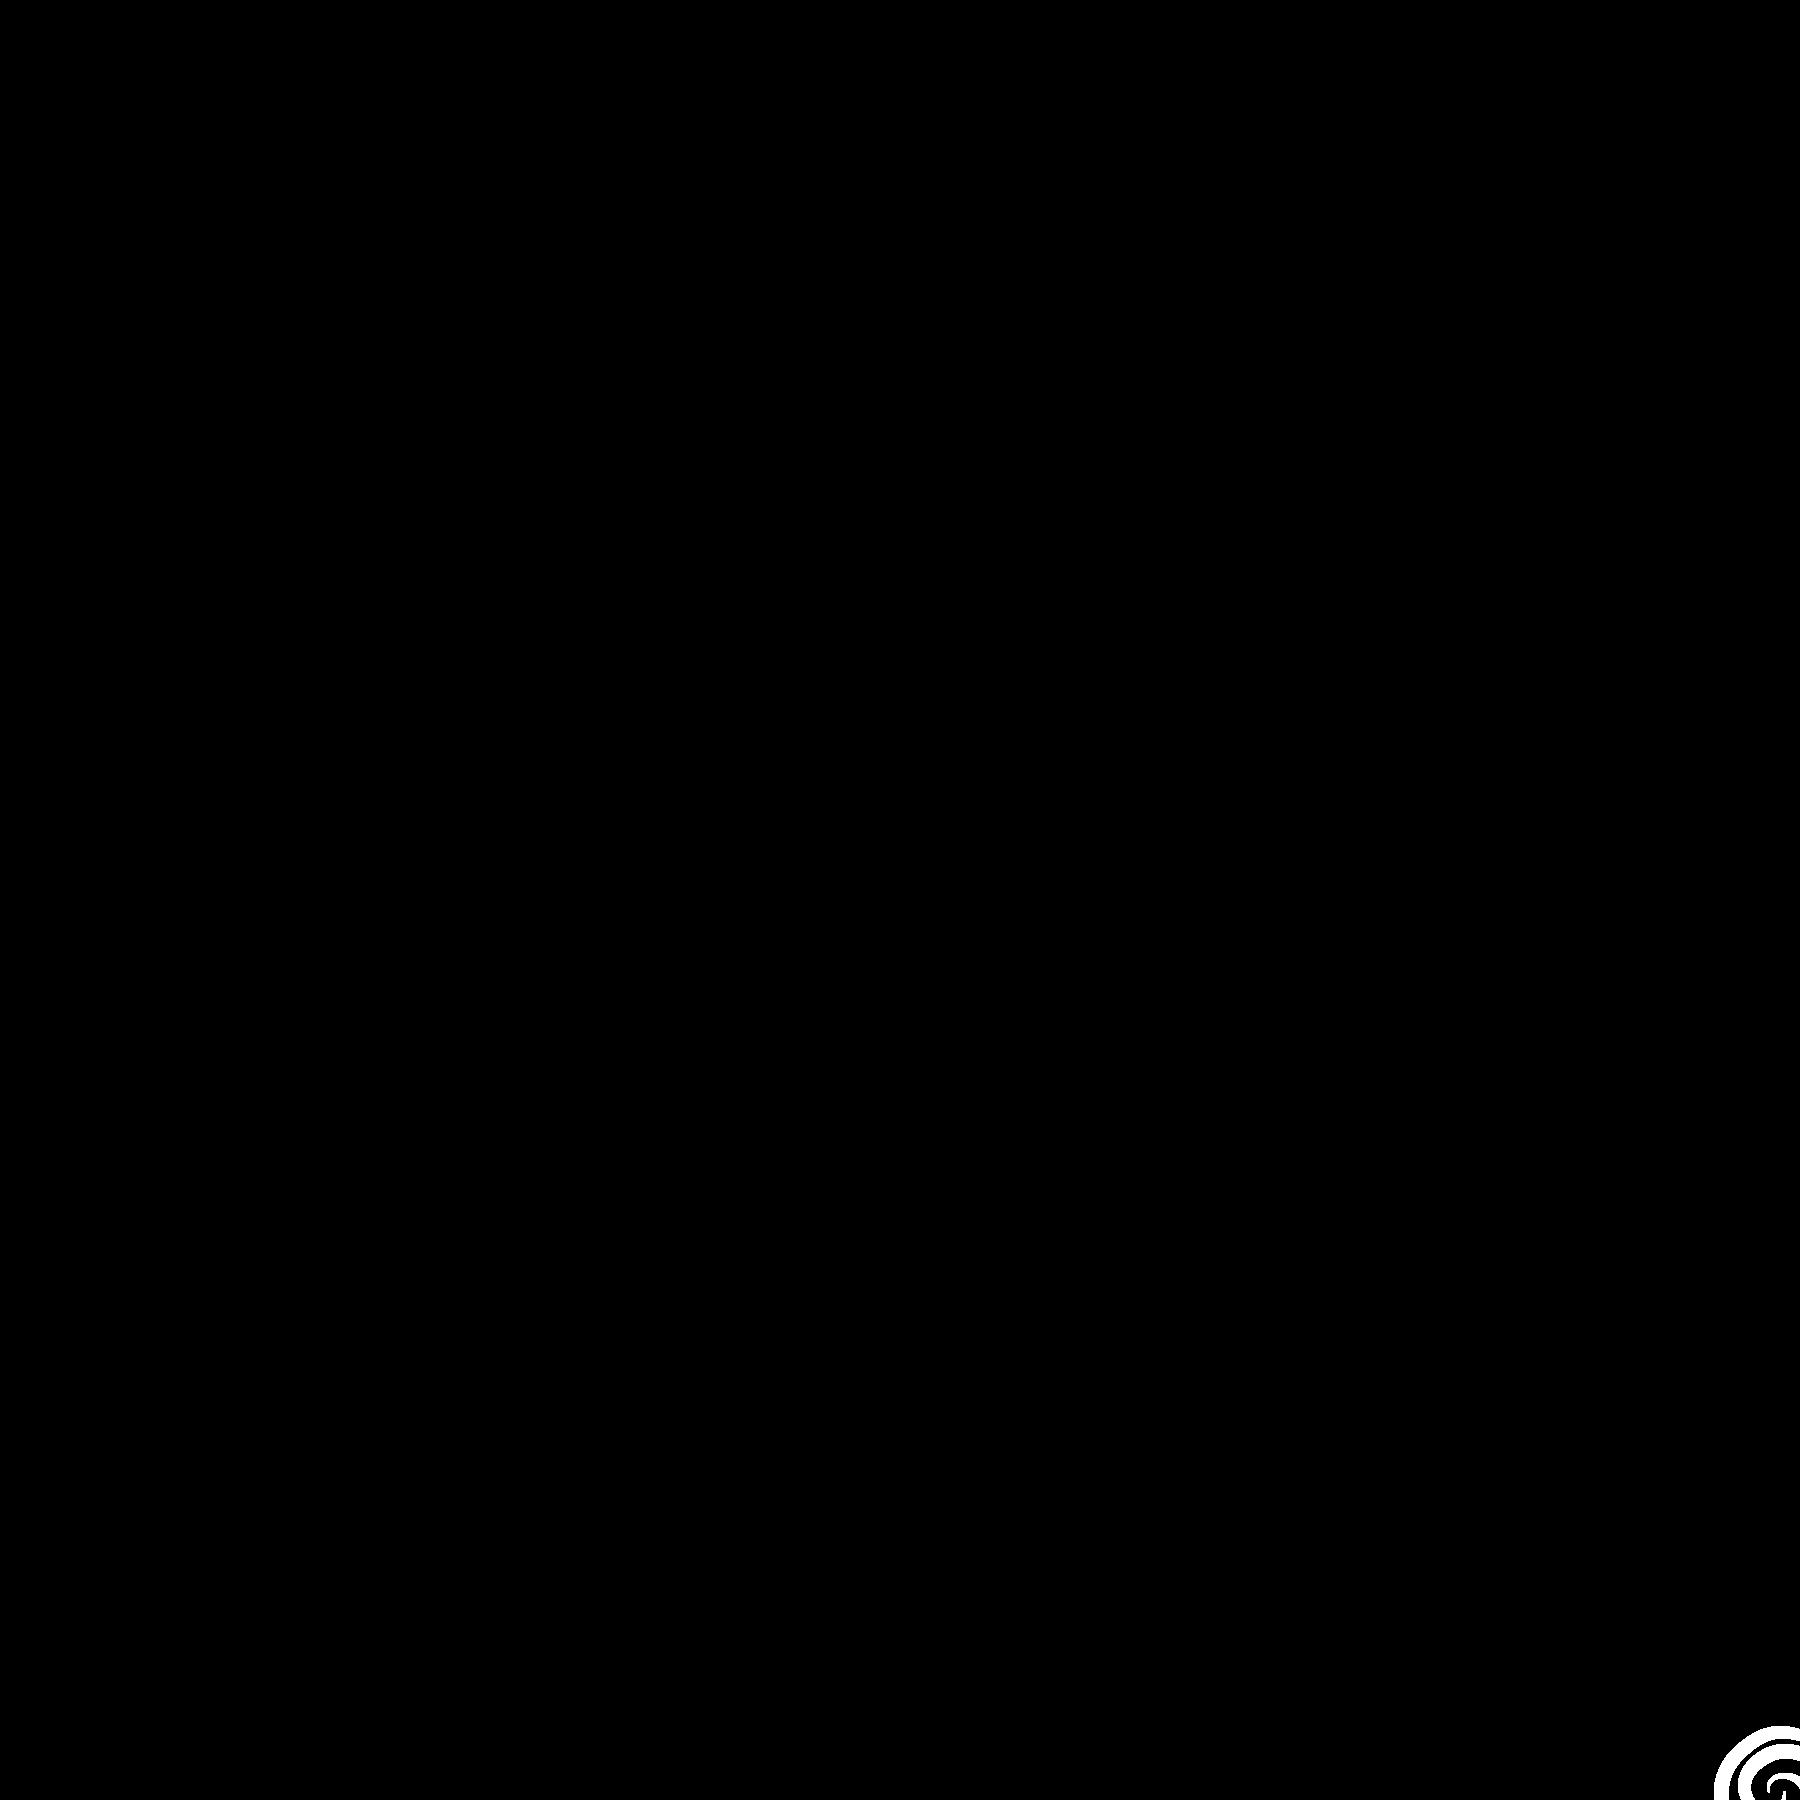 Basic Symbols-19.png